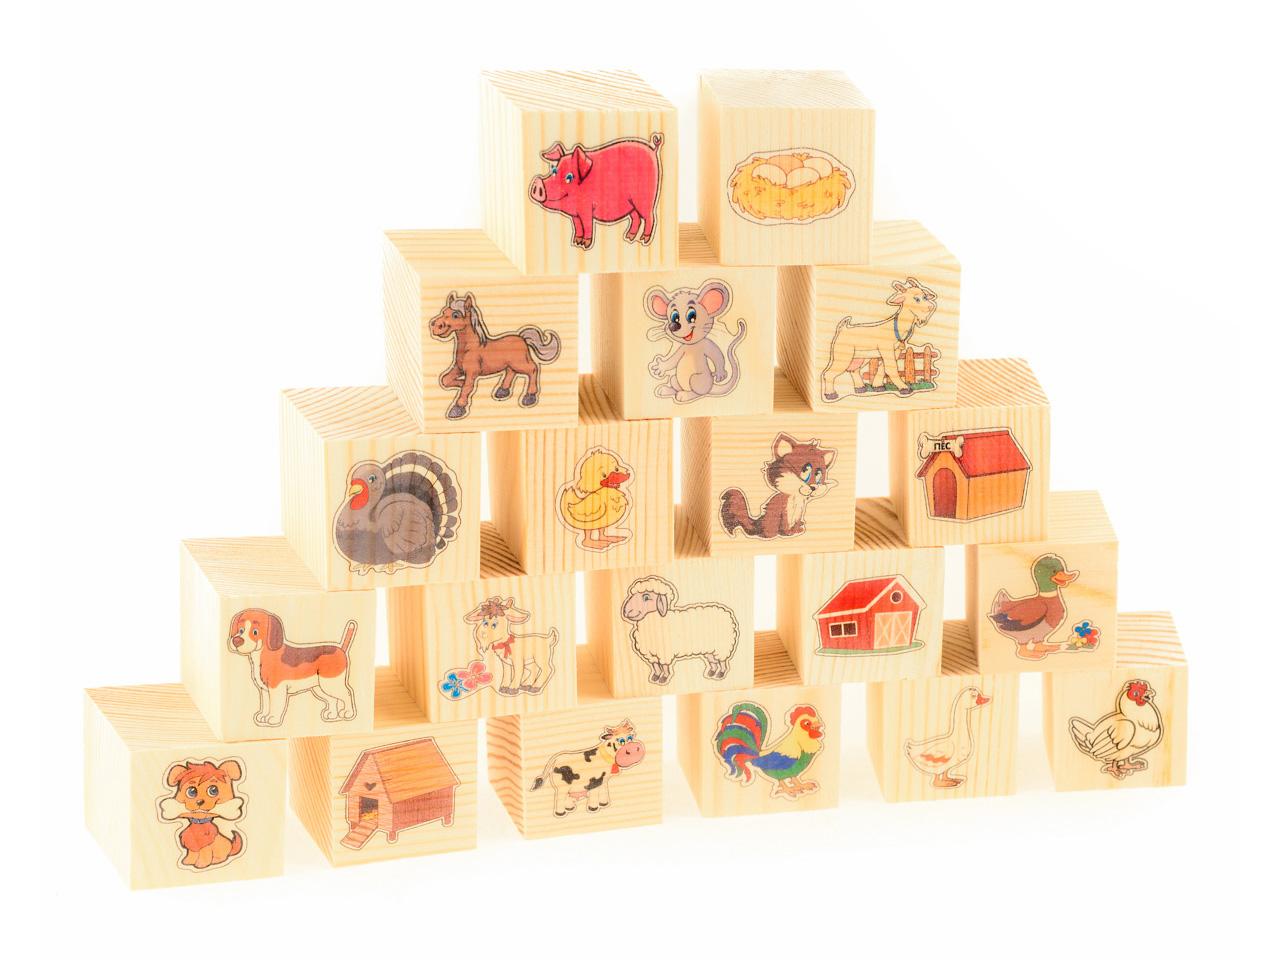 Фото - Развивающие деревянные игрушки Кубики На ферме развивающие деревянные игрушки кубики фрукты